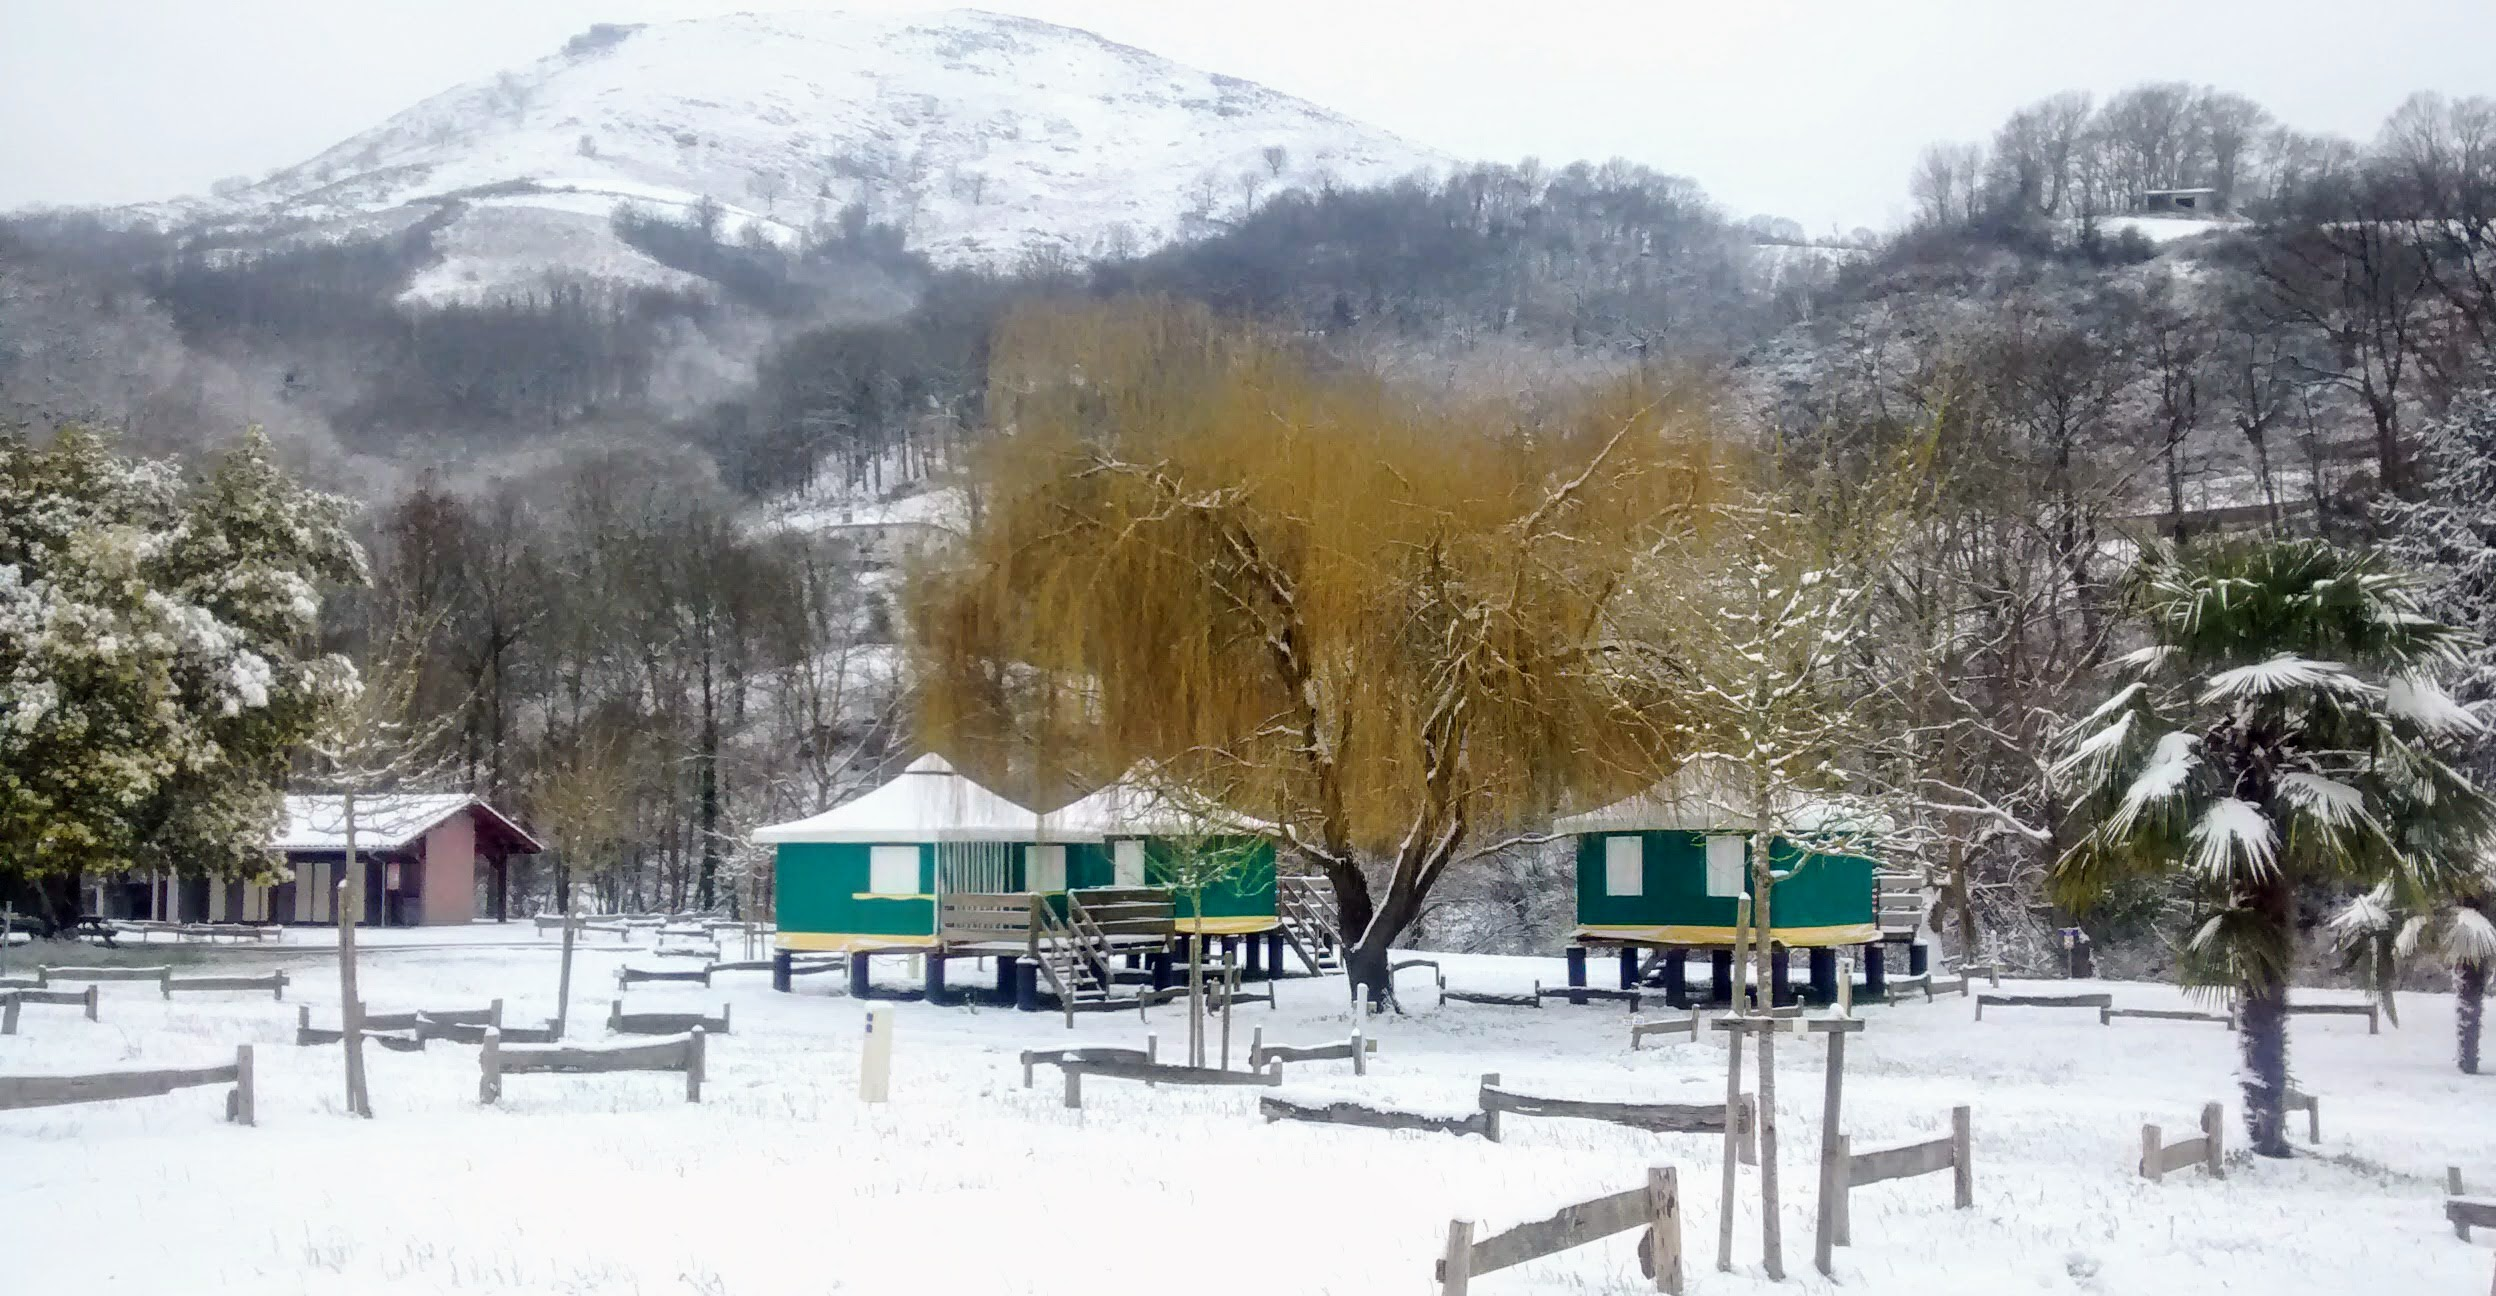 camping Amestoya de Bidarray sous la neige